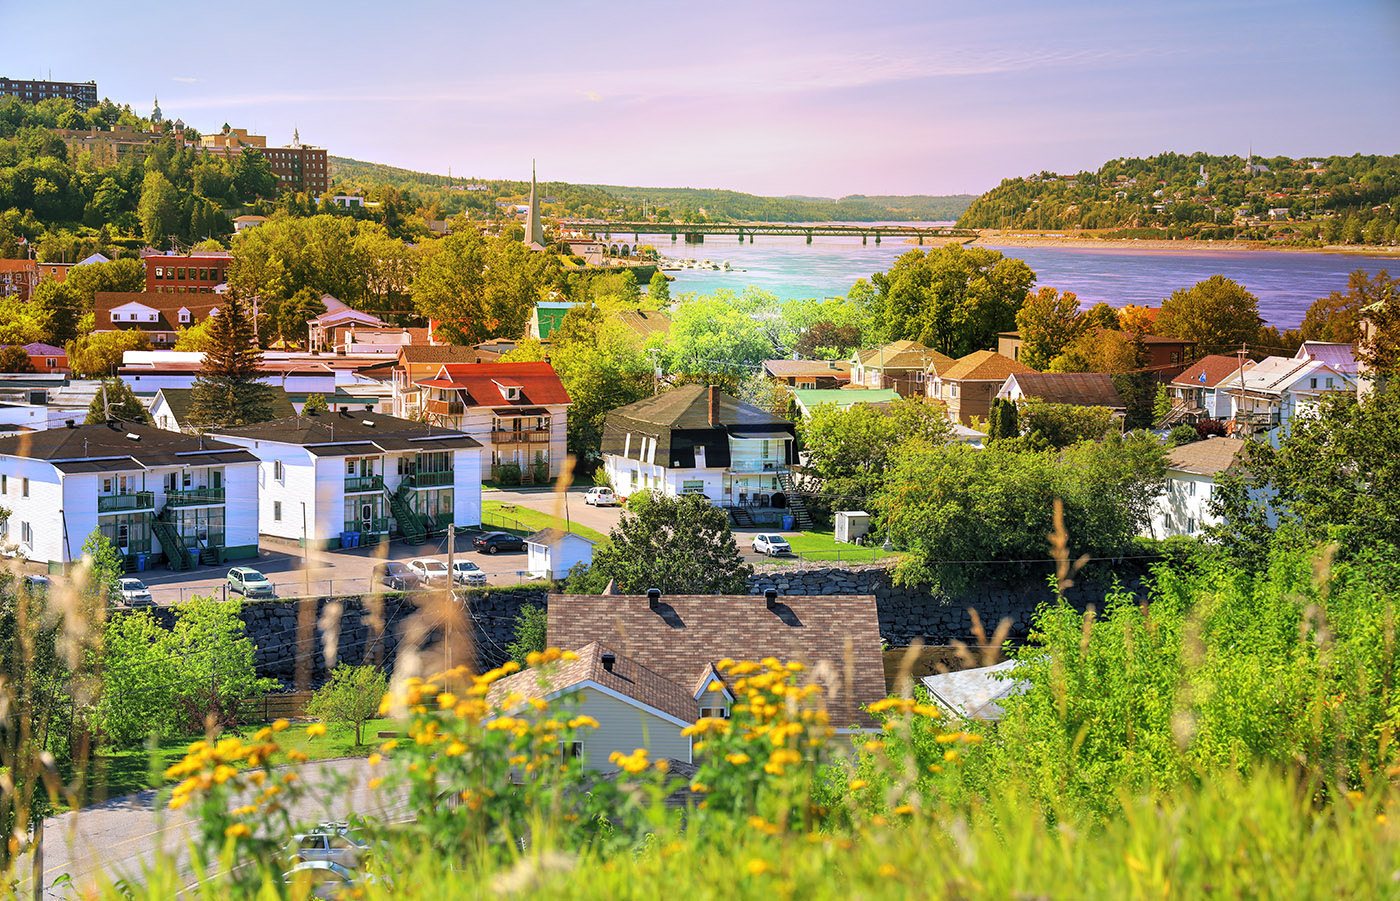 Saguenay City Neighborhood - Colorful Stock Photos